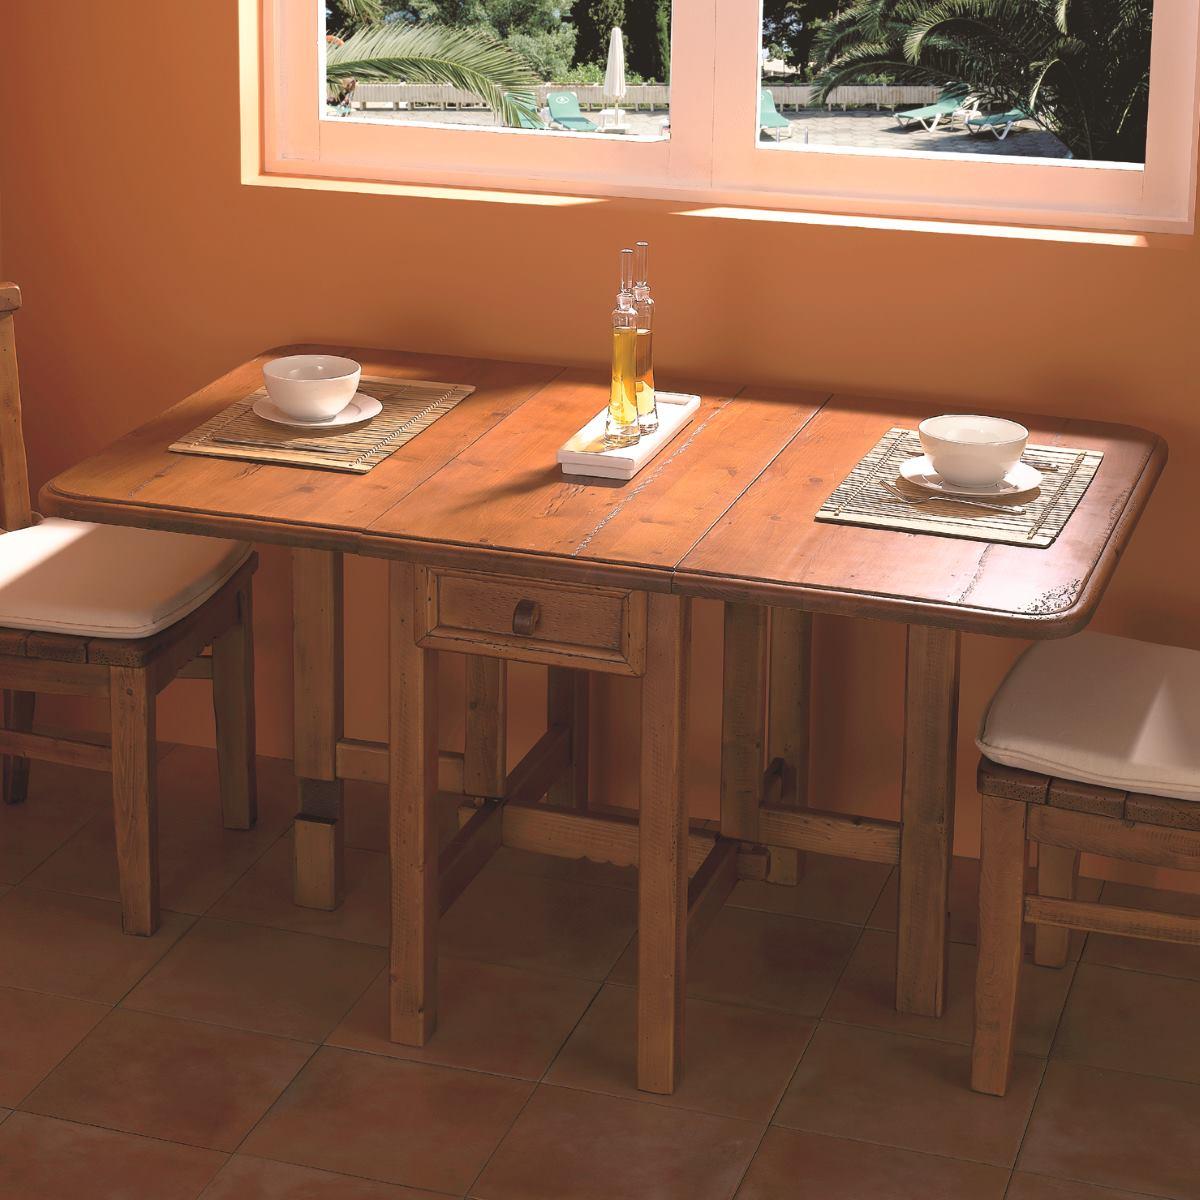 Mesa de madera r stica abatible con caj n 142cm - Mesa madera rustica ...